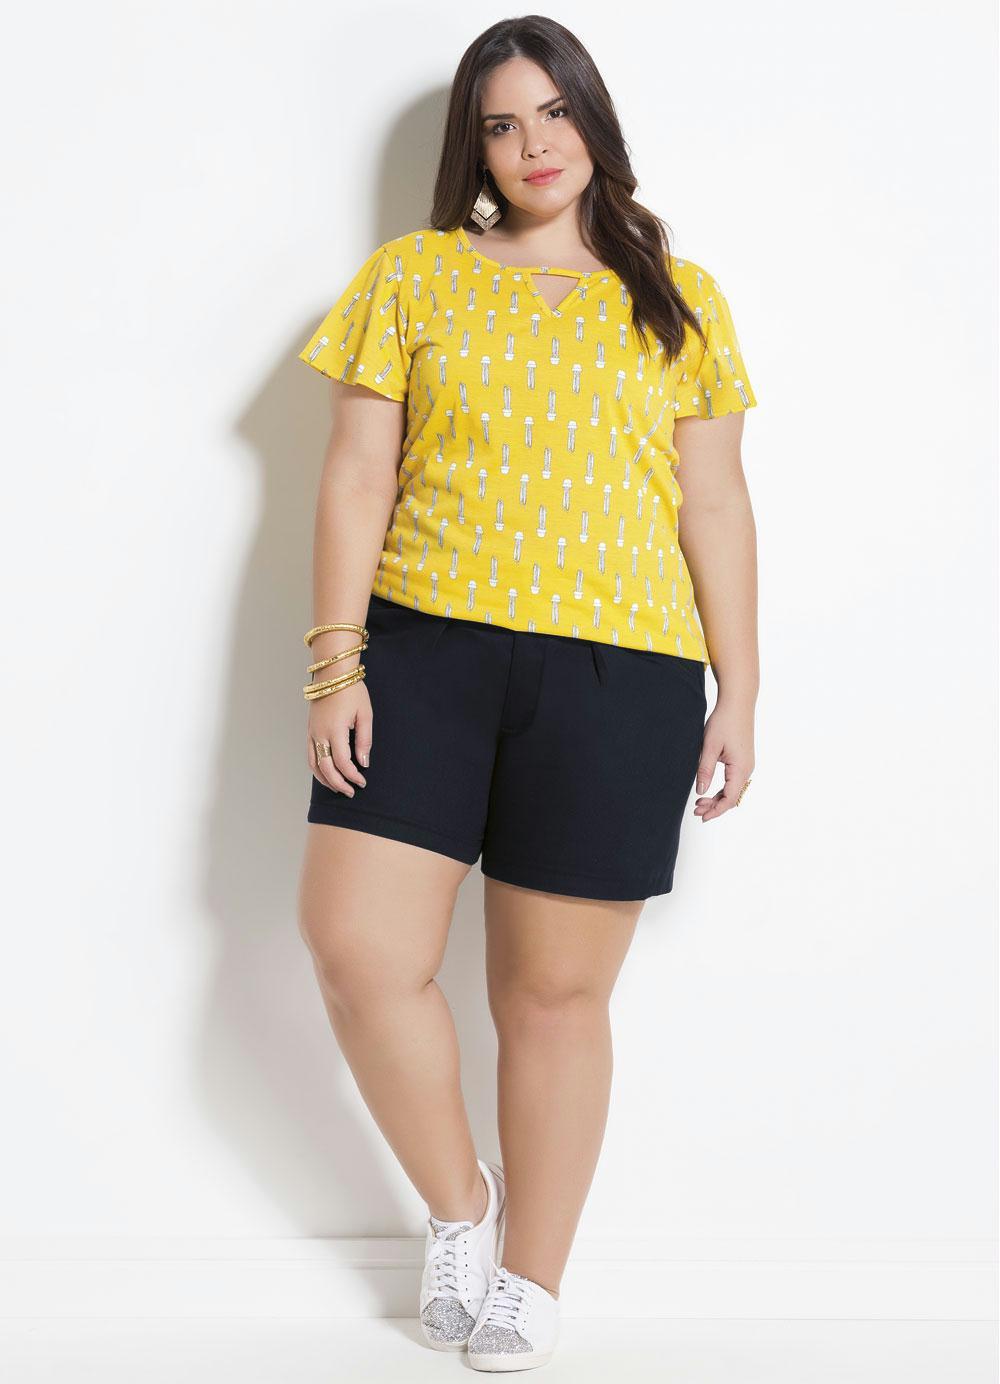 ec3fbba4e1 T-Shirt Cactos com Tira Marguerite Plus Size - Marguerite